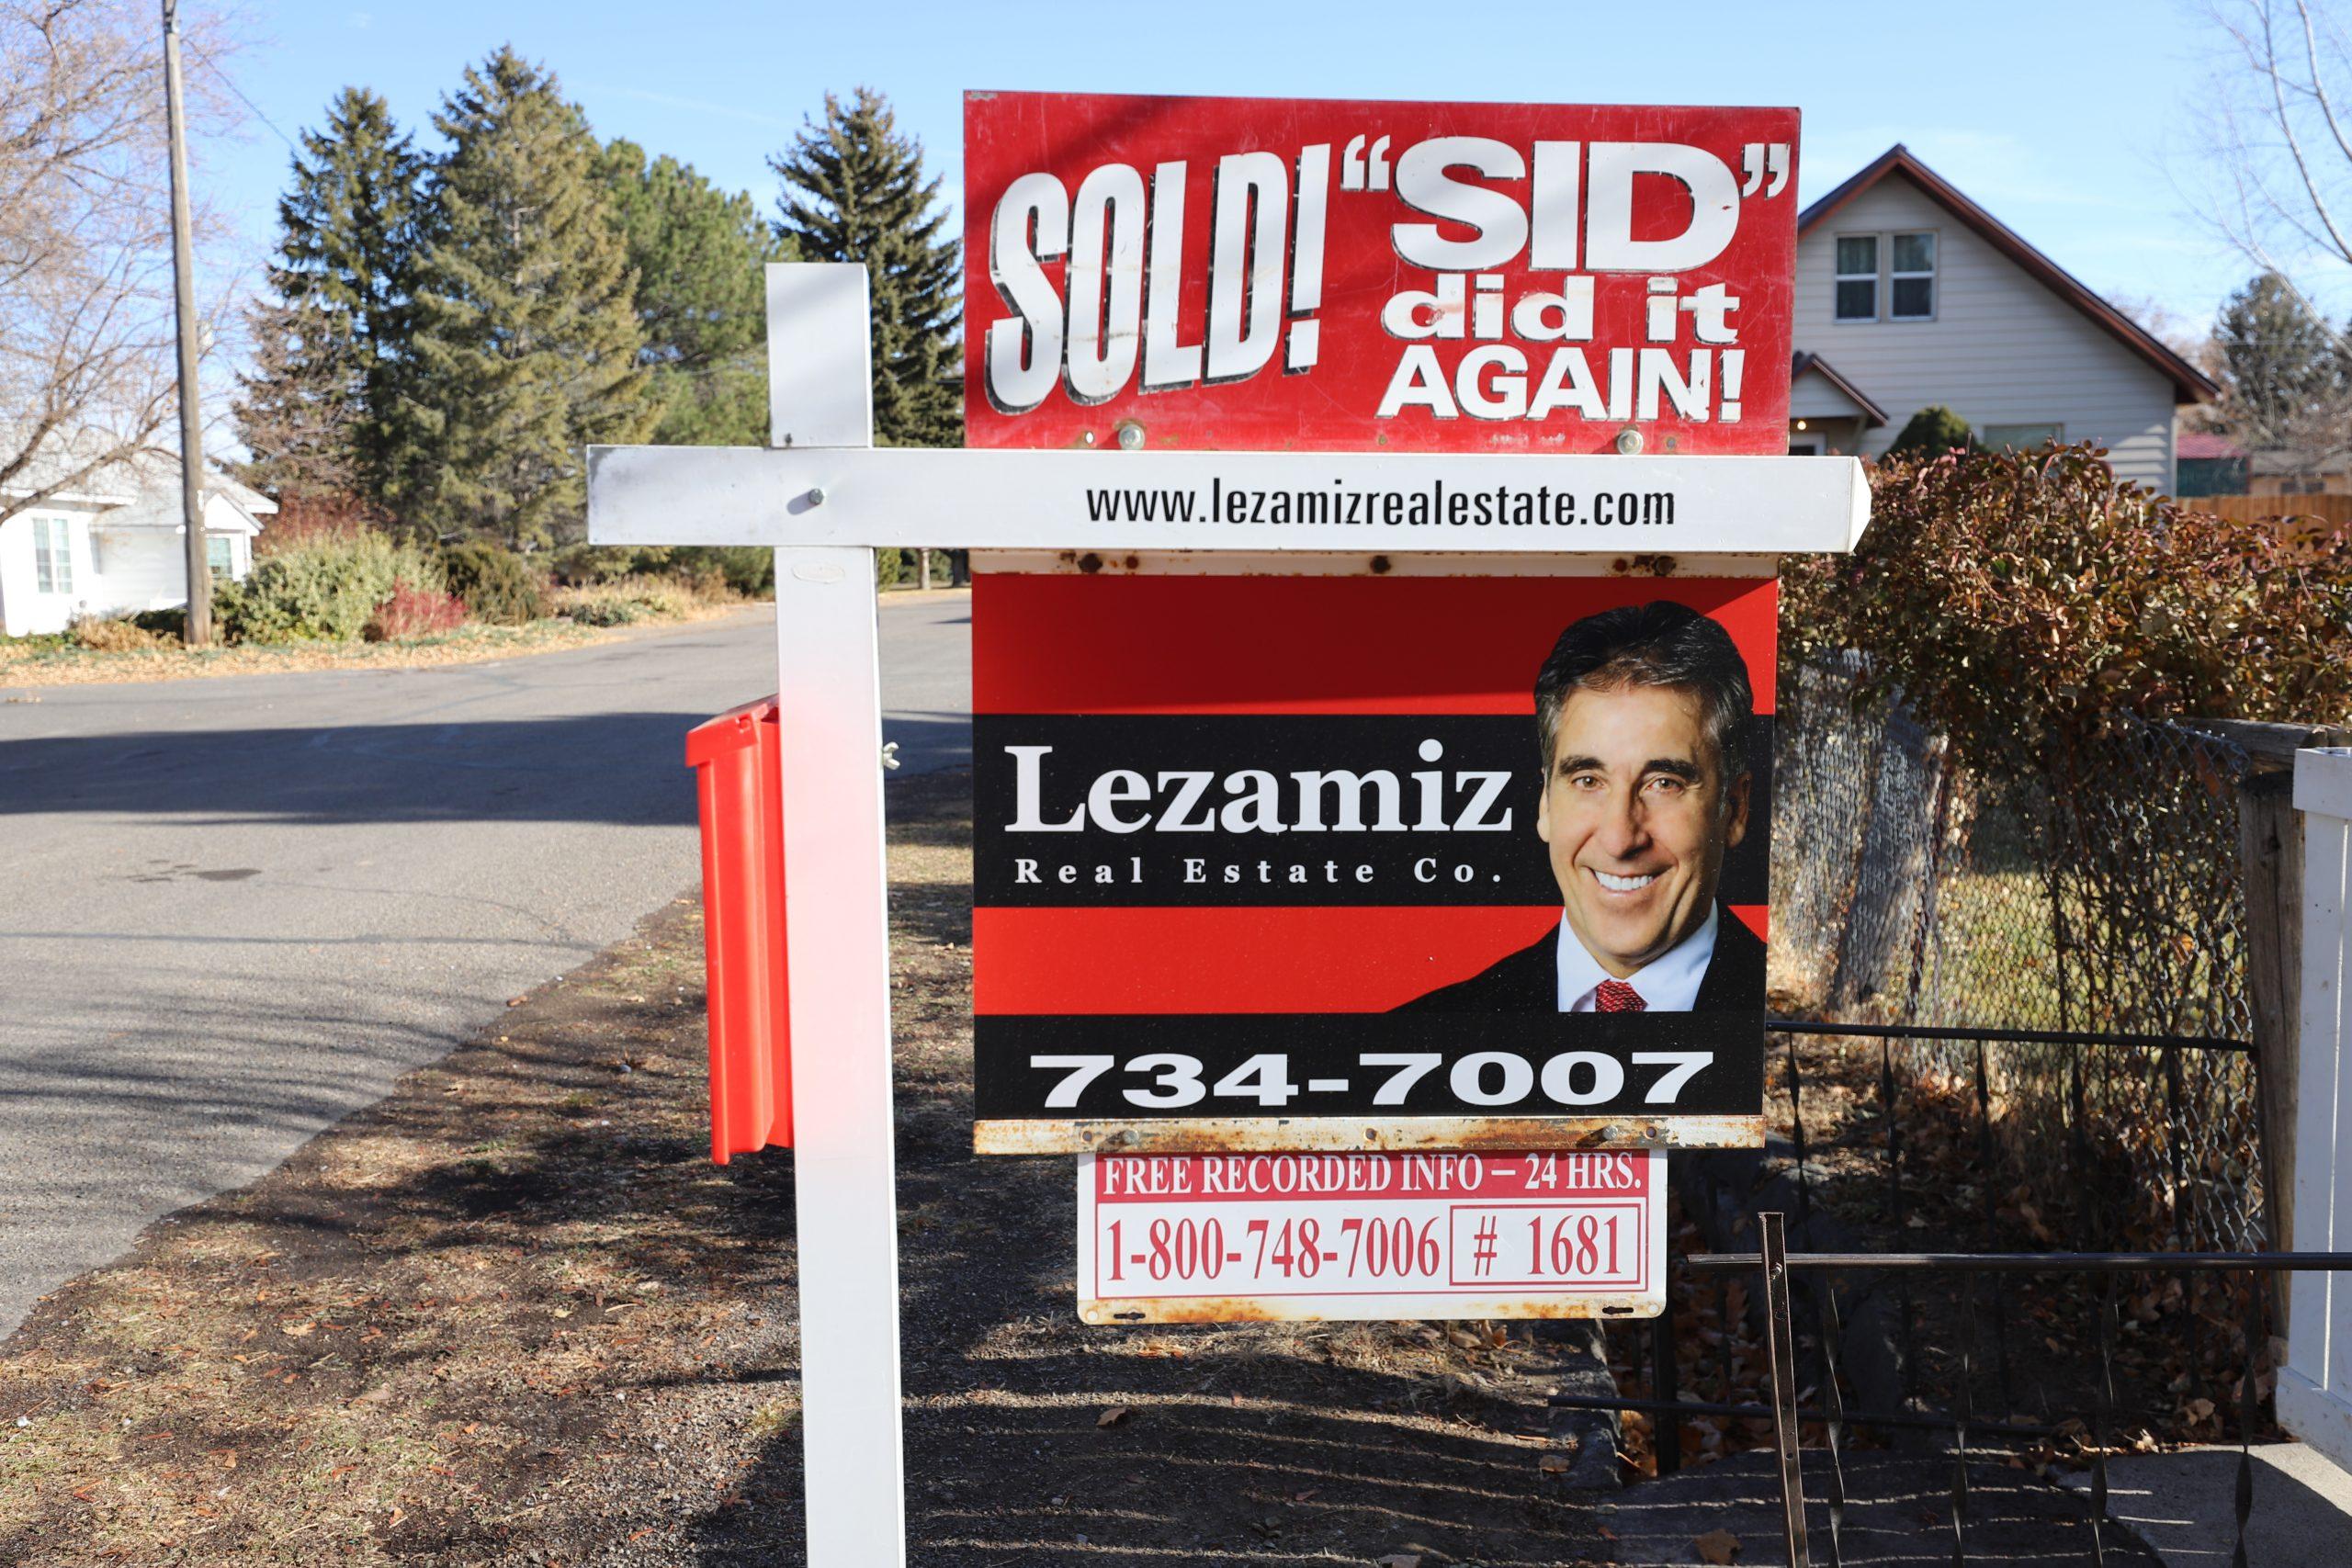 Sold!  Sid did it again!